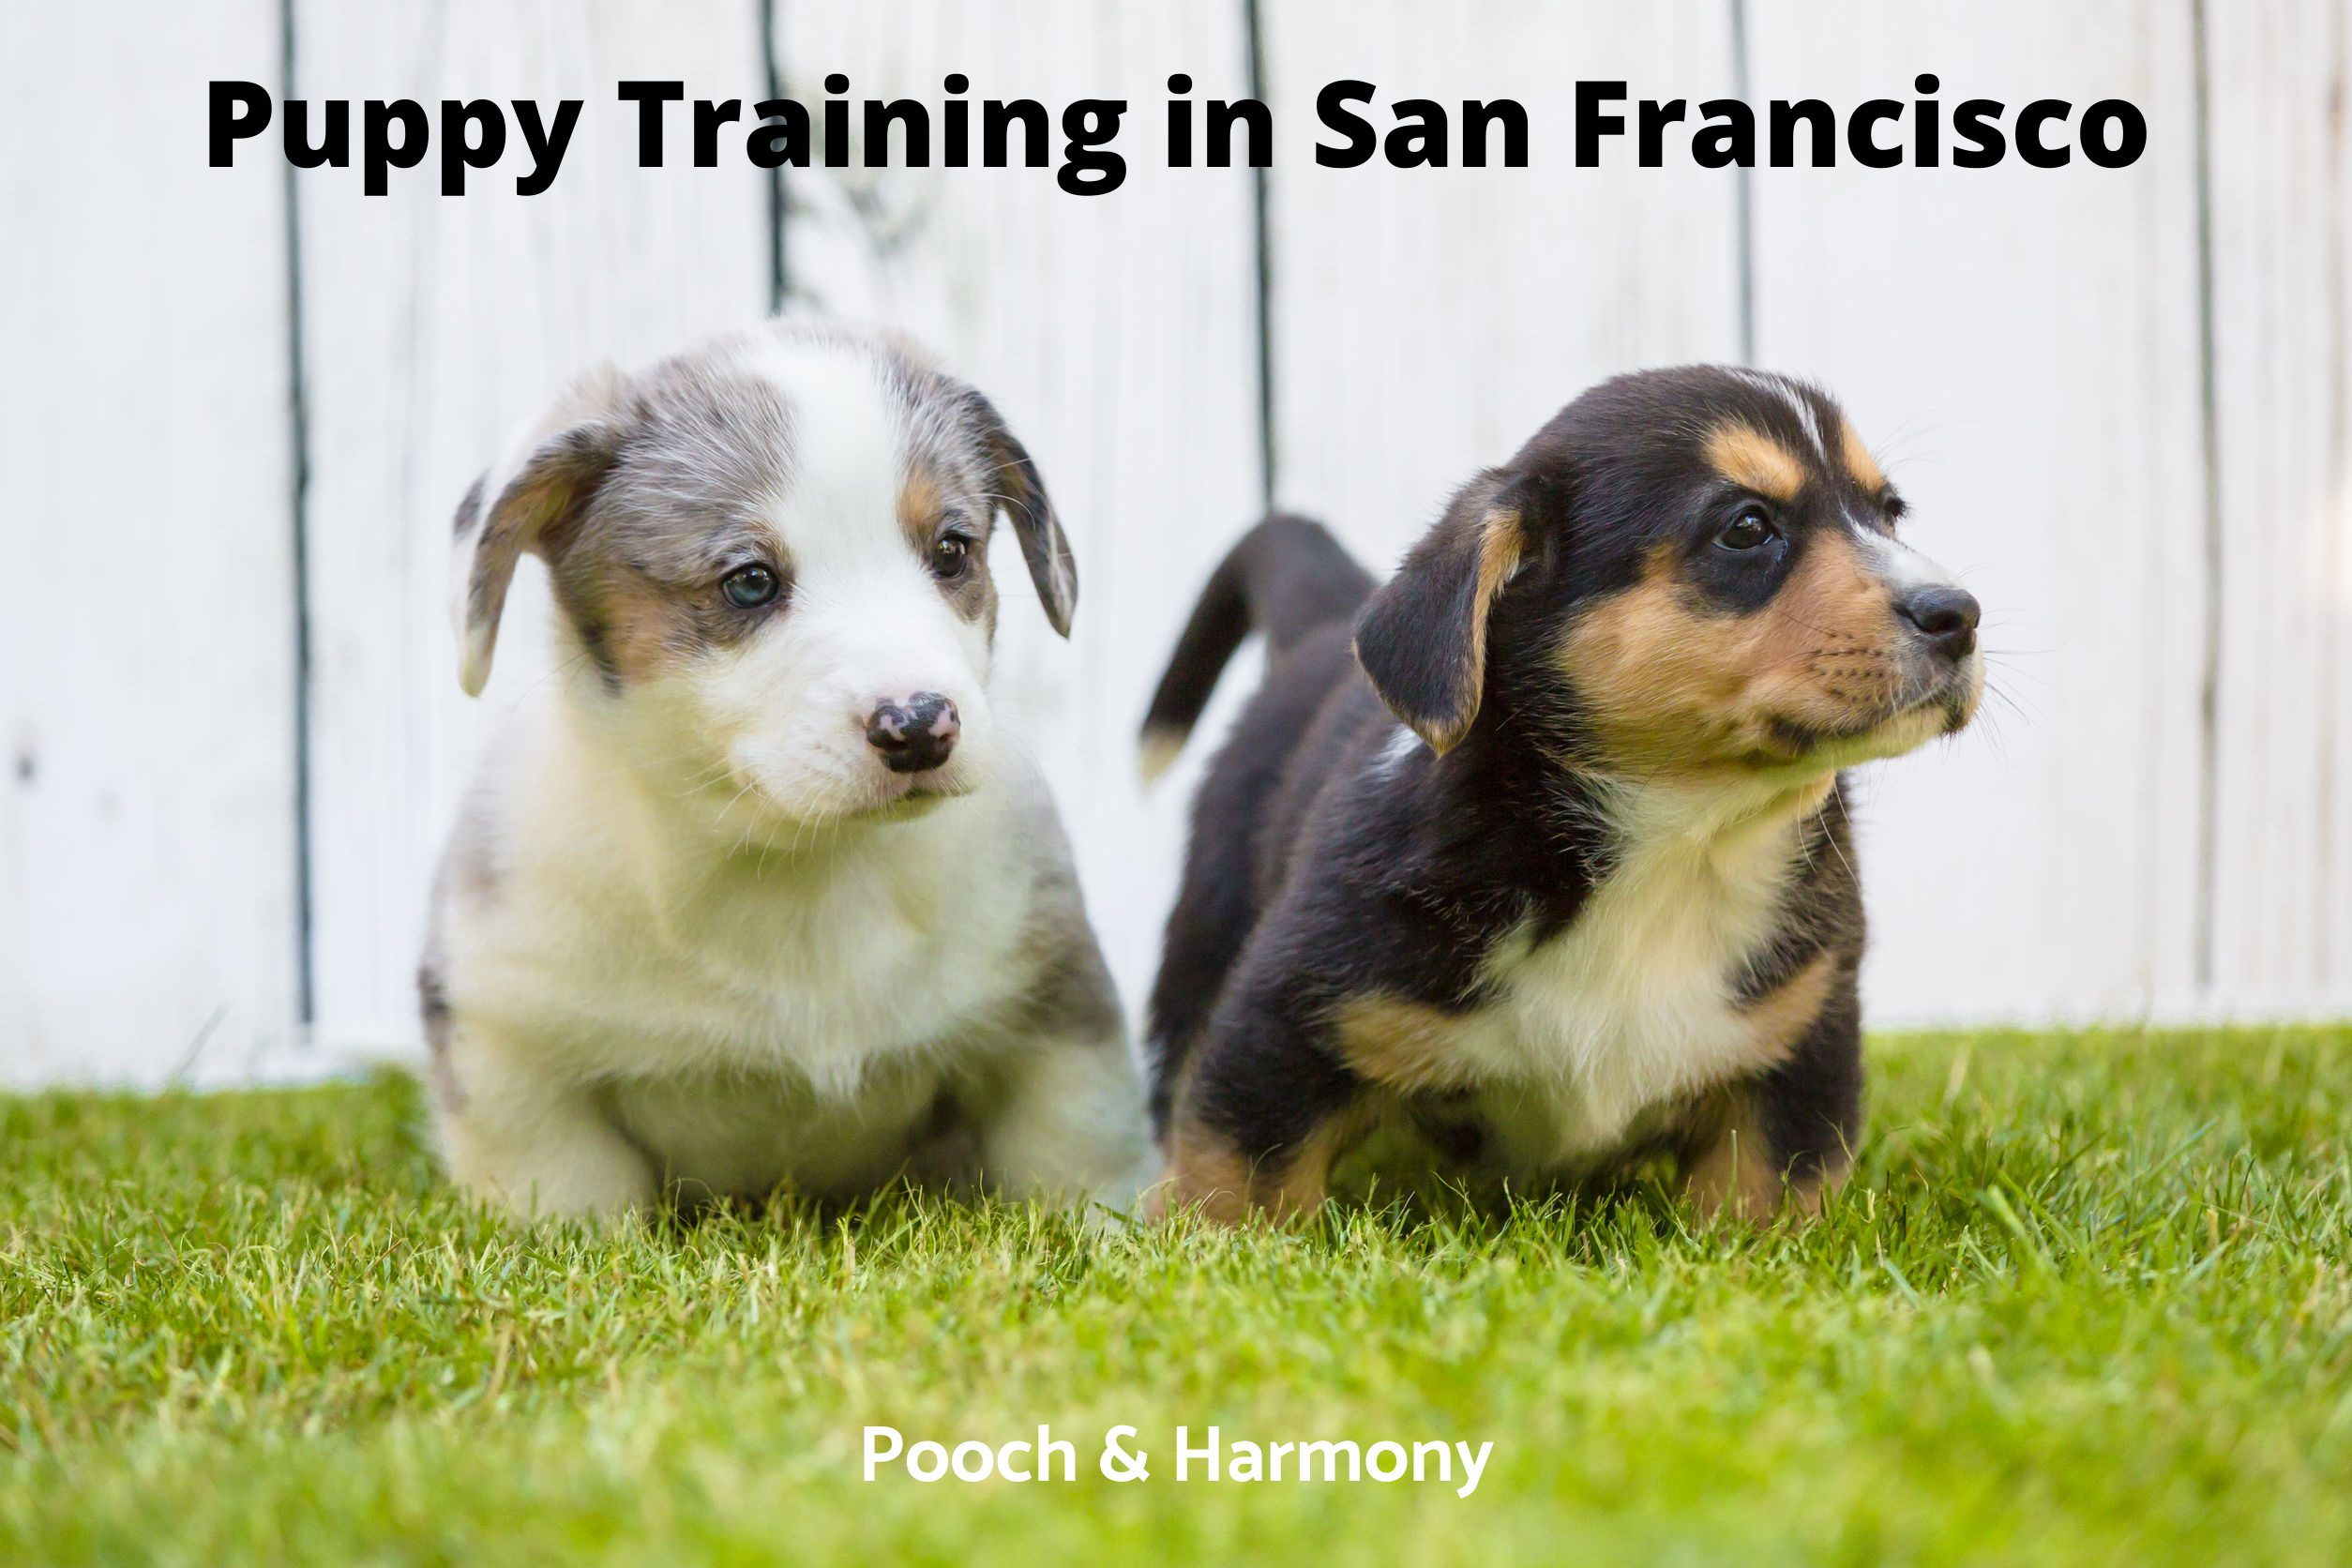 Puppy Training in San Francisco